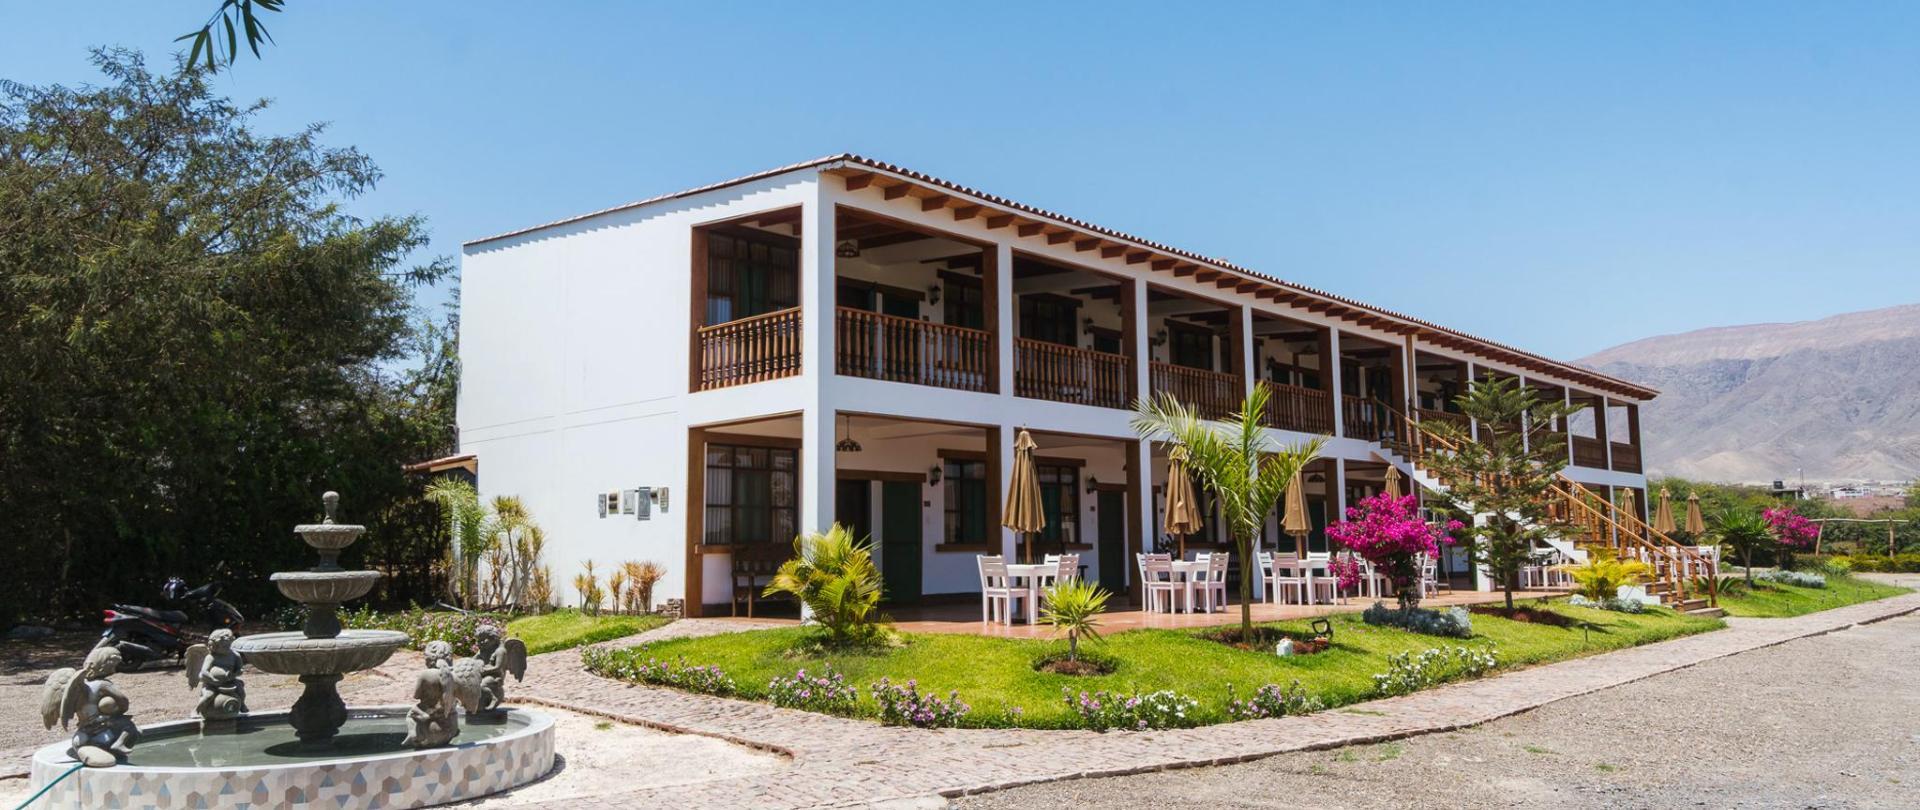 Casa Hacienda Nazca Oasis-5 mas peqeuño.jpg